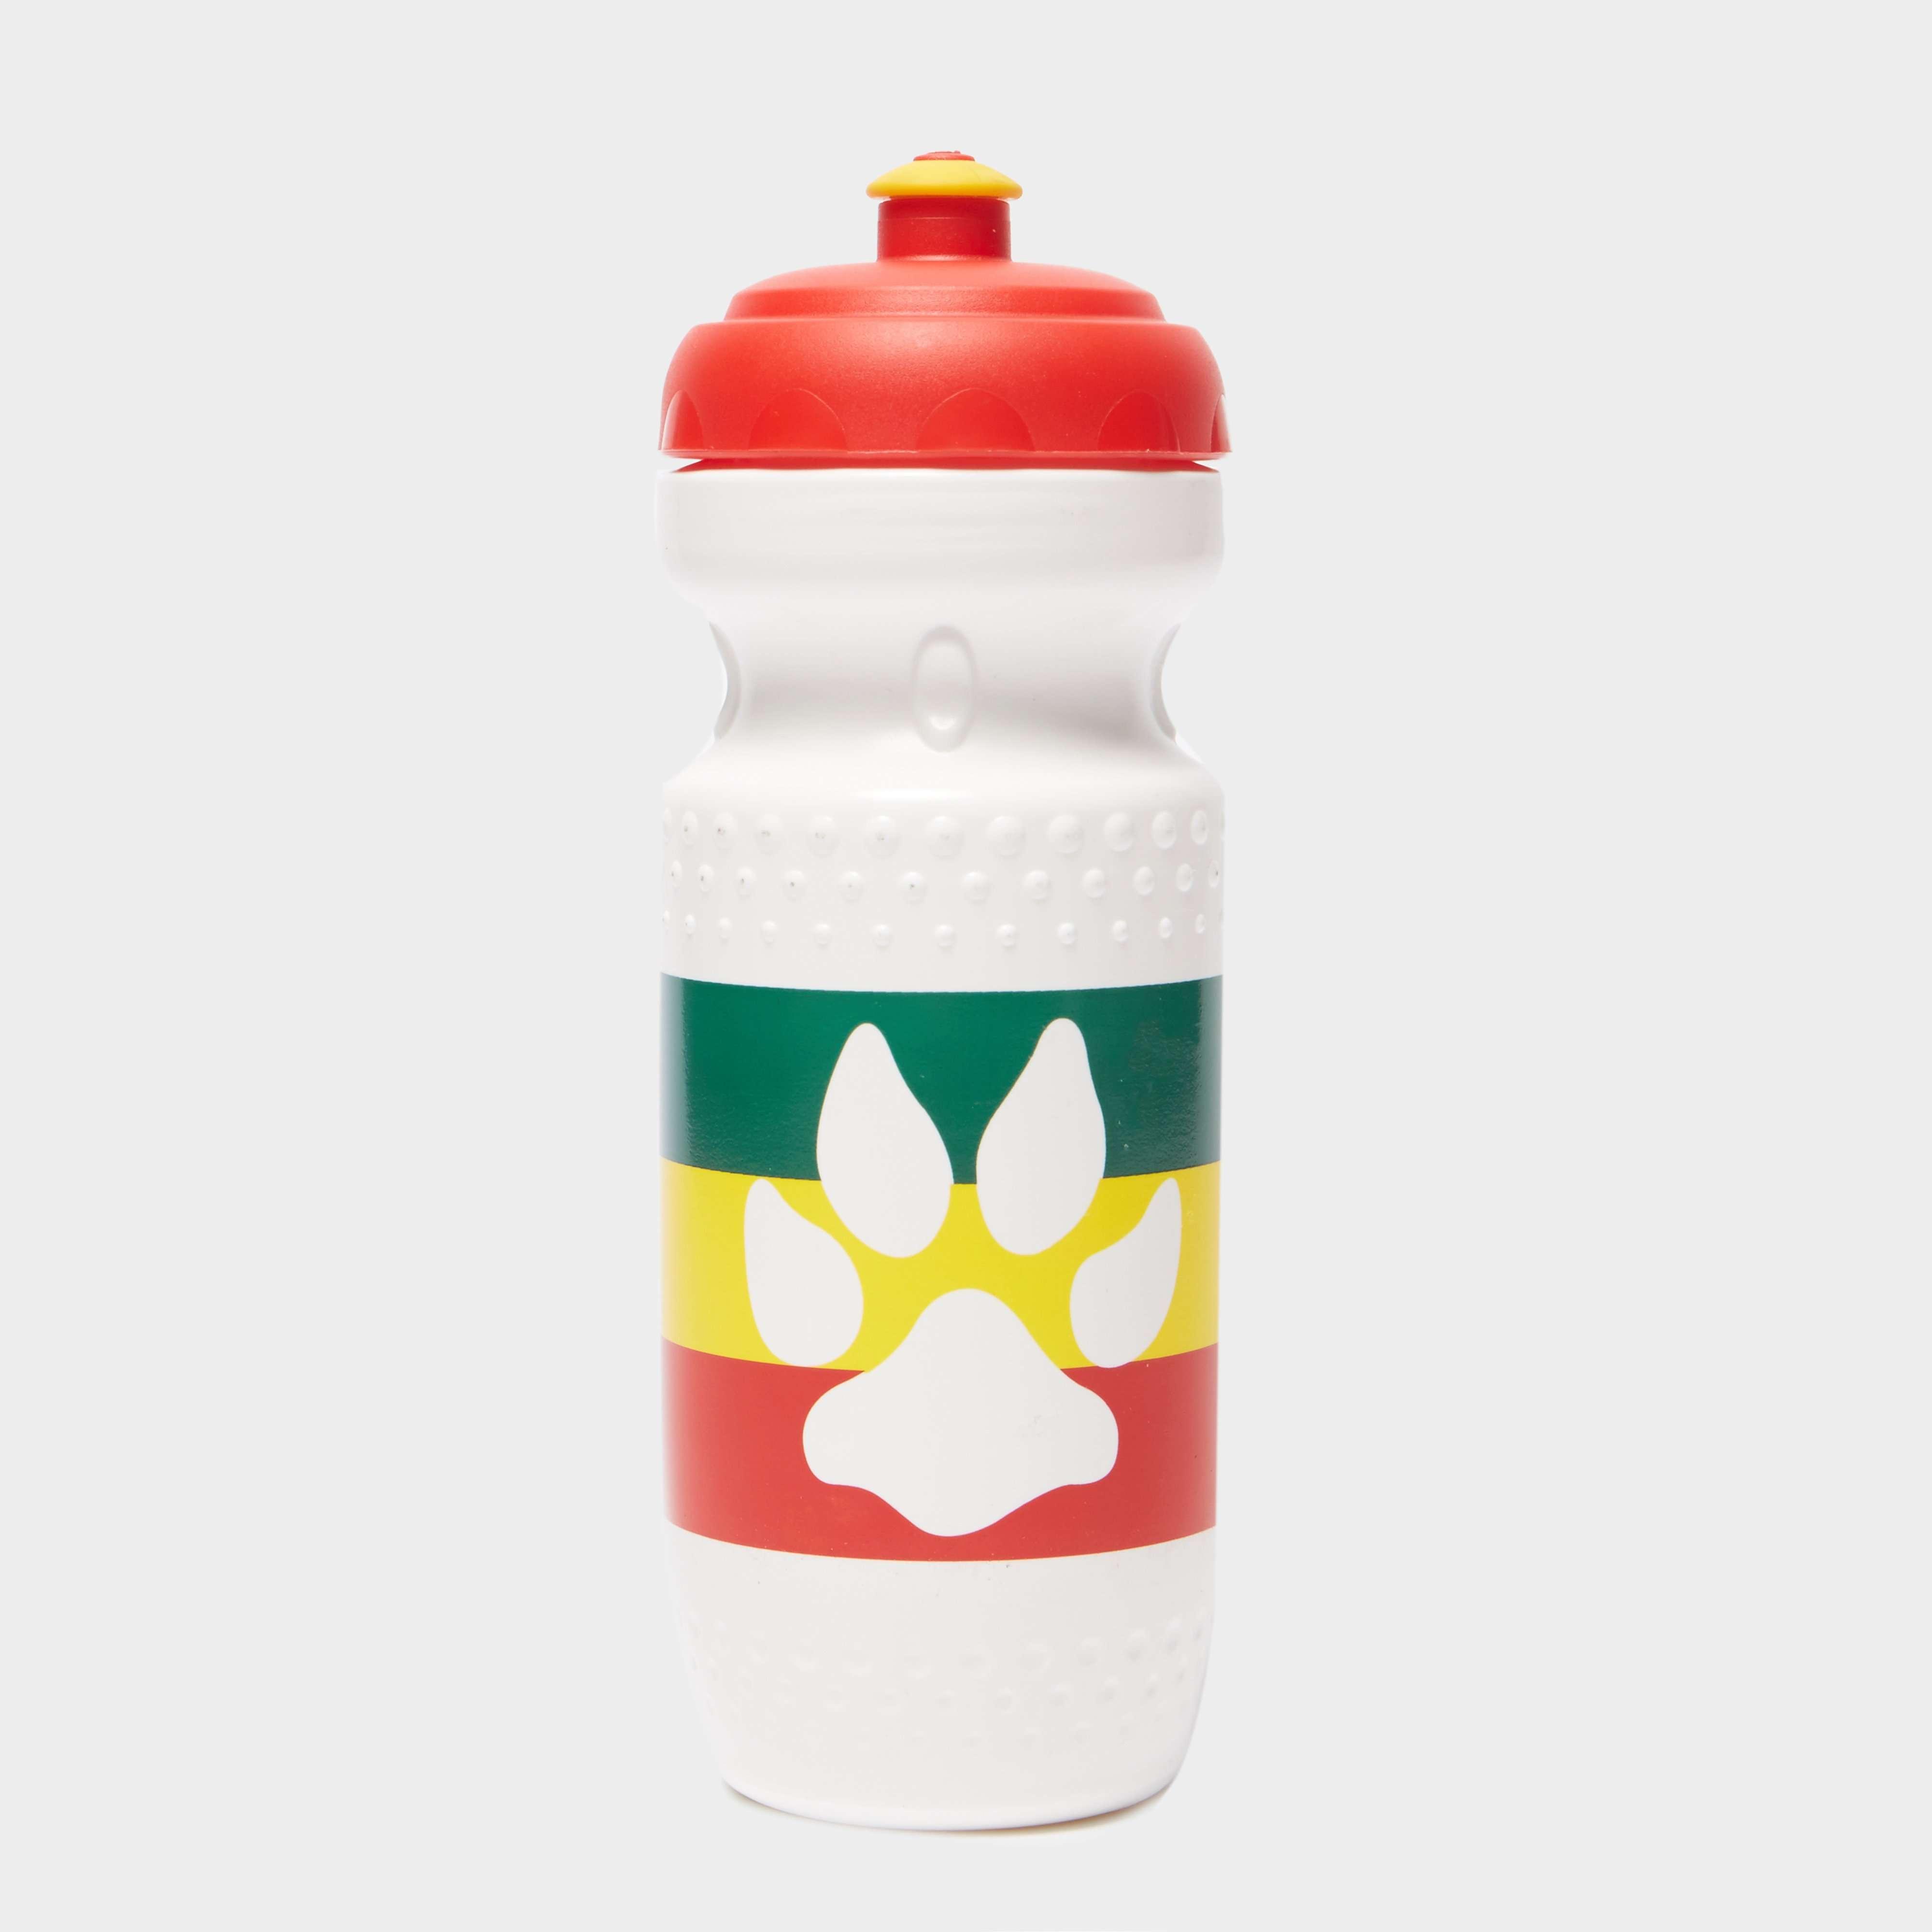 BONTRAGER Screwtop Heritage Silo Bottle